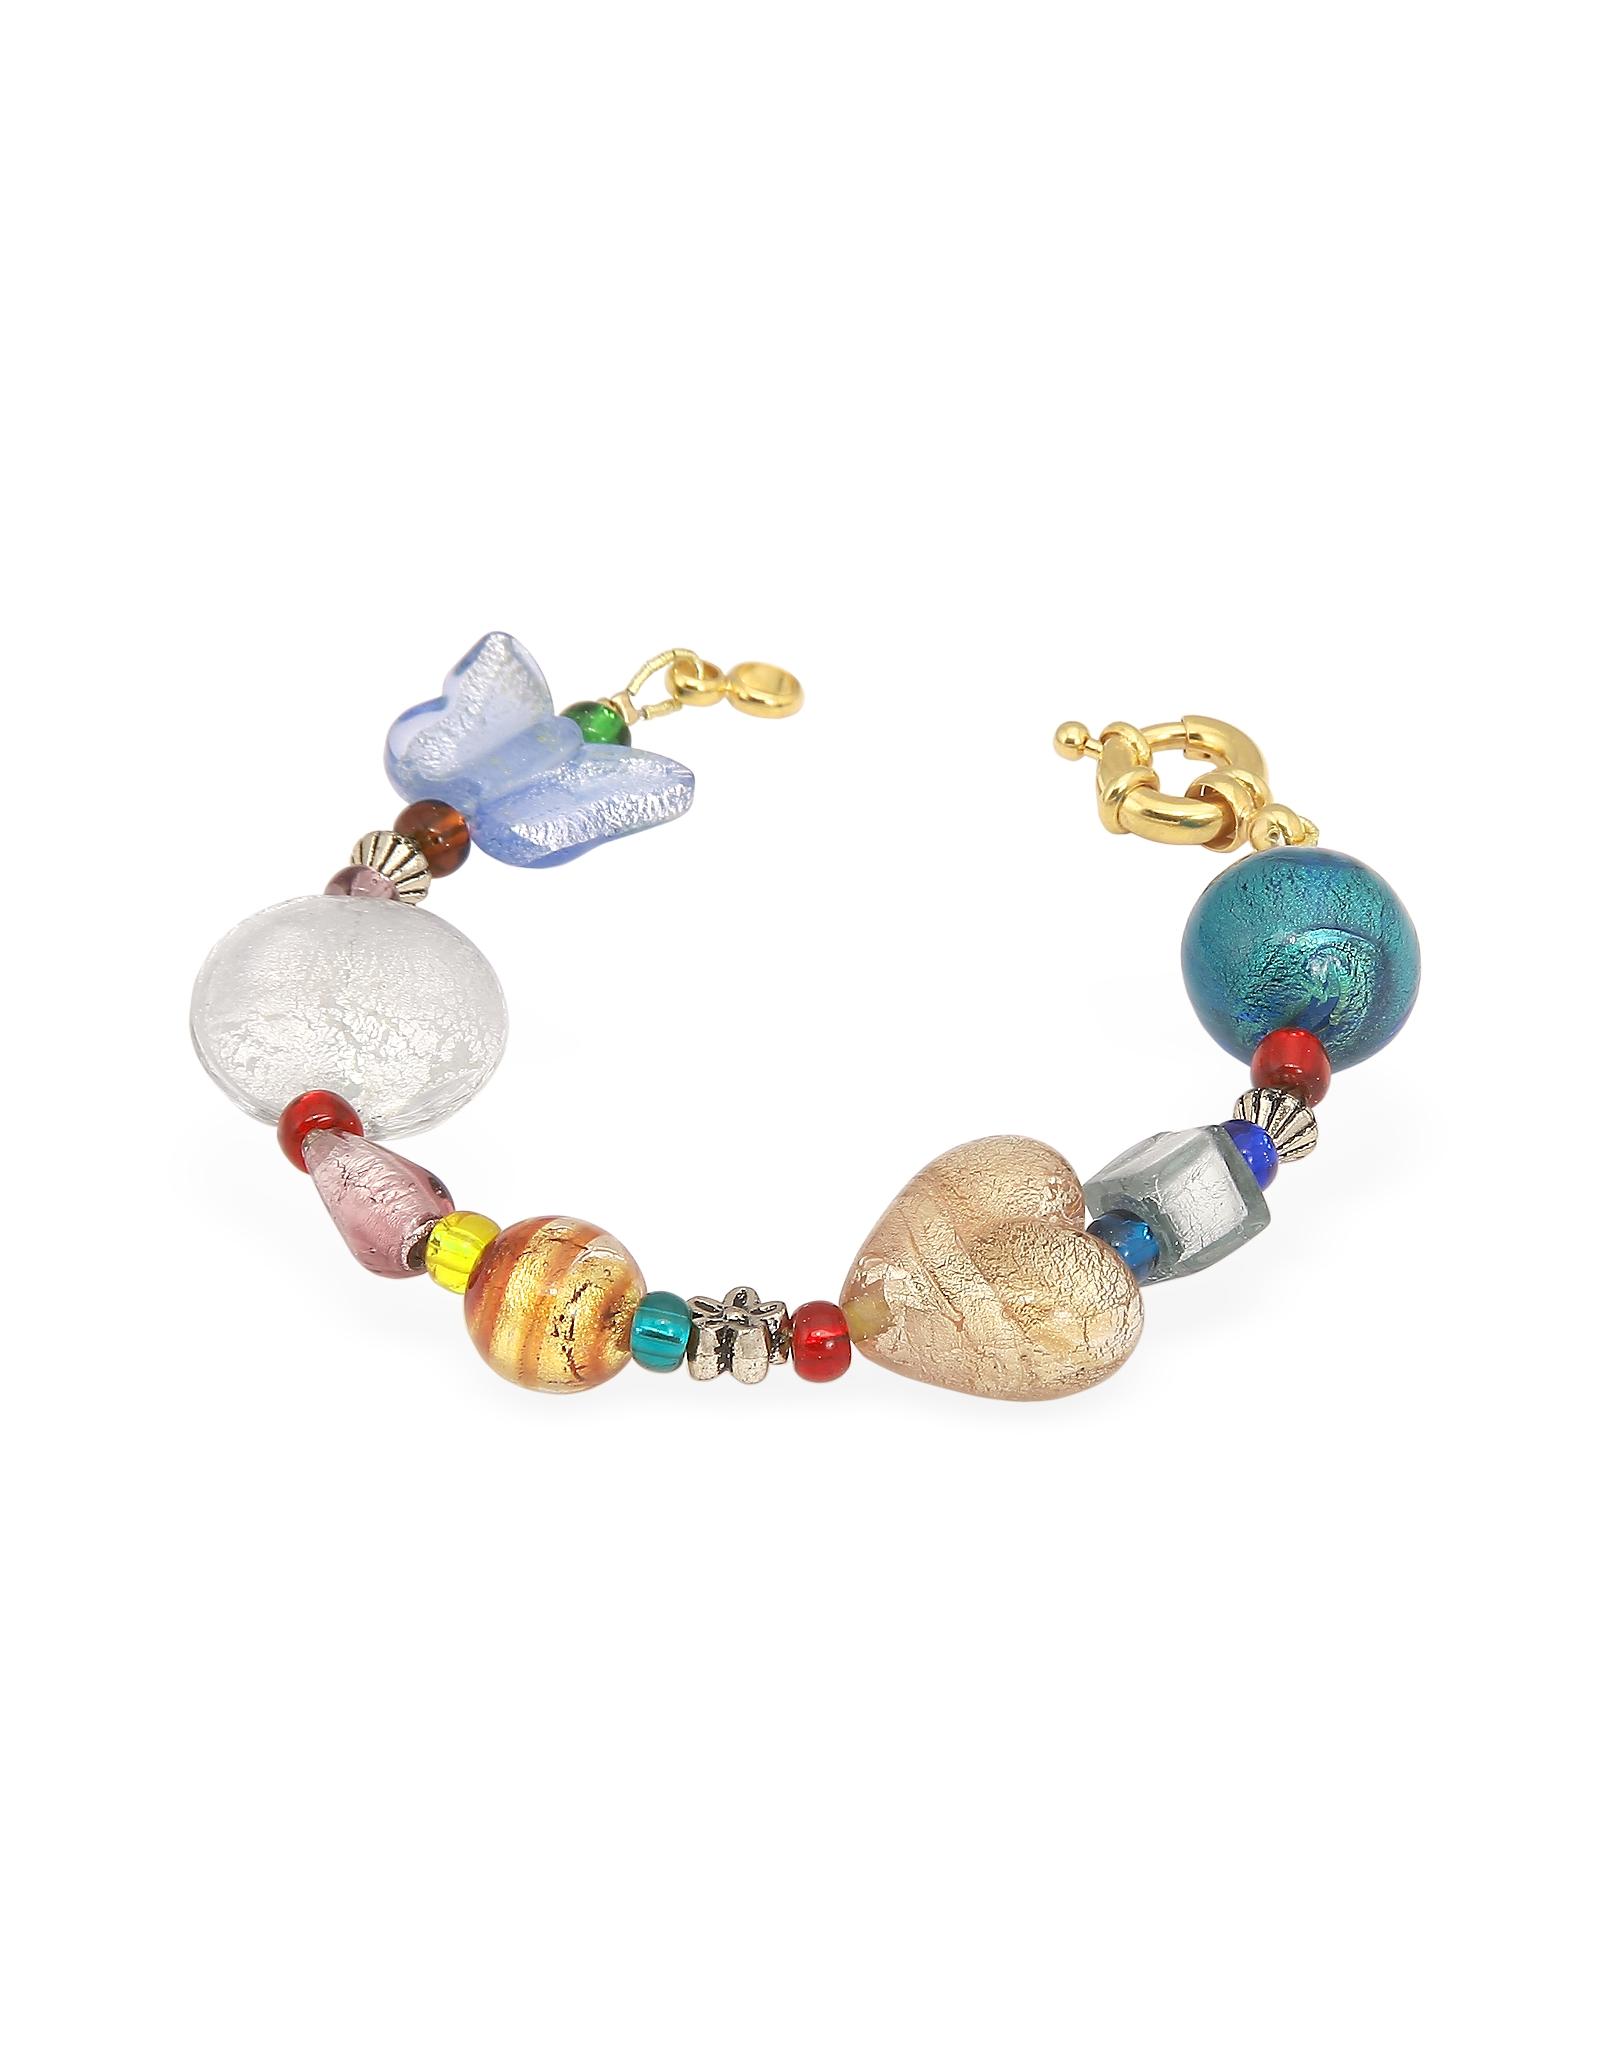 beads venice - photo#23